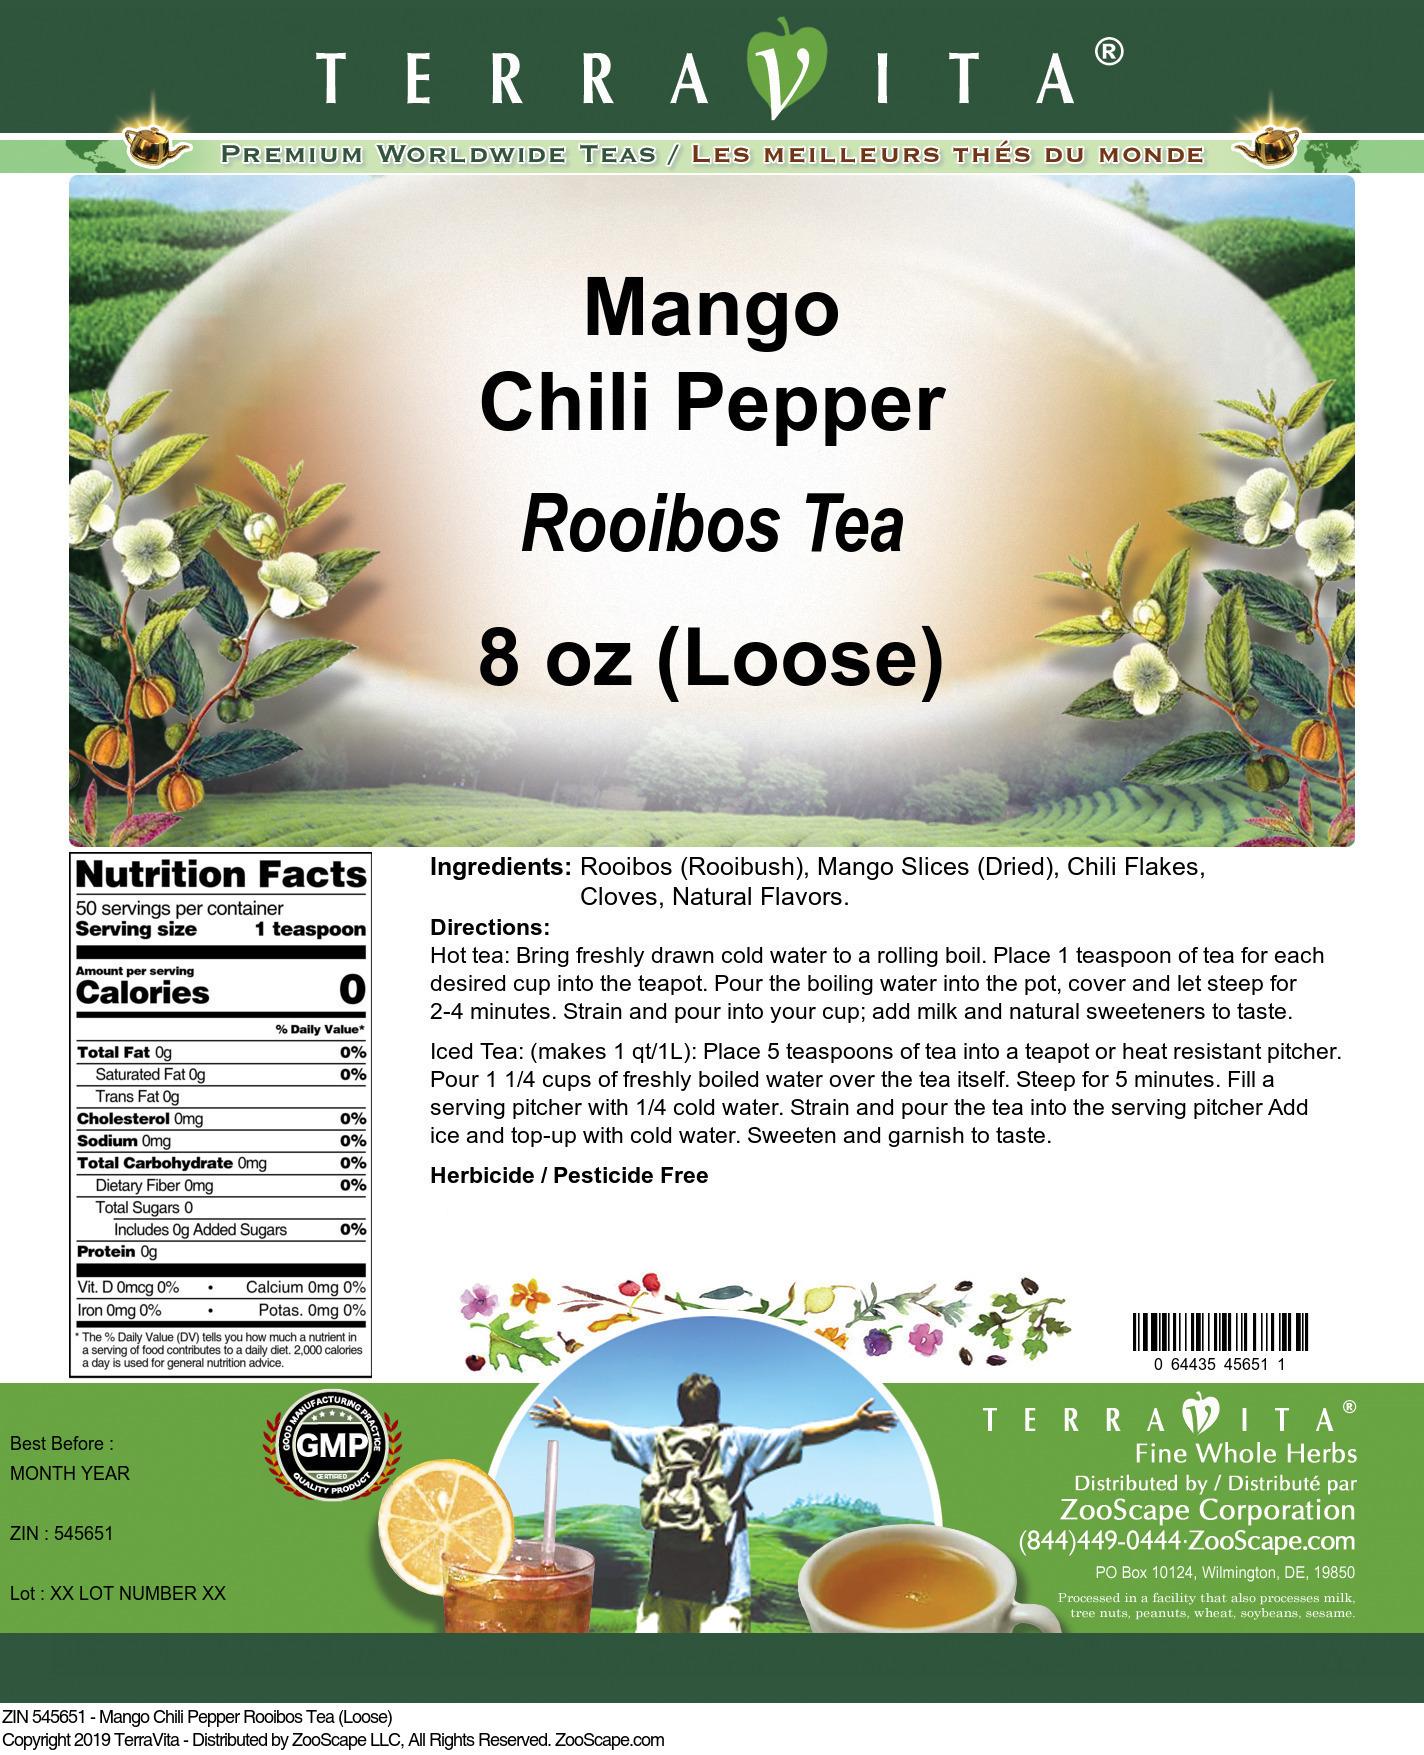 Mango Chili Pepper Rooibos Tea (Loose)